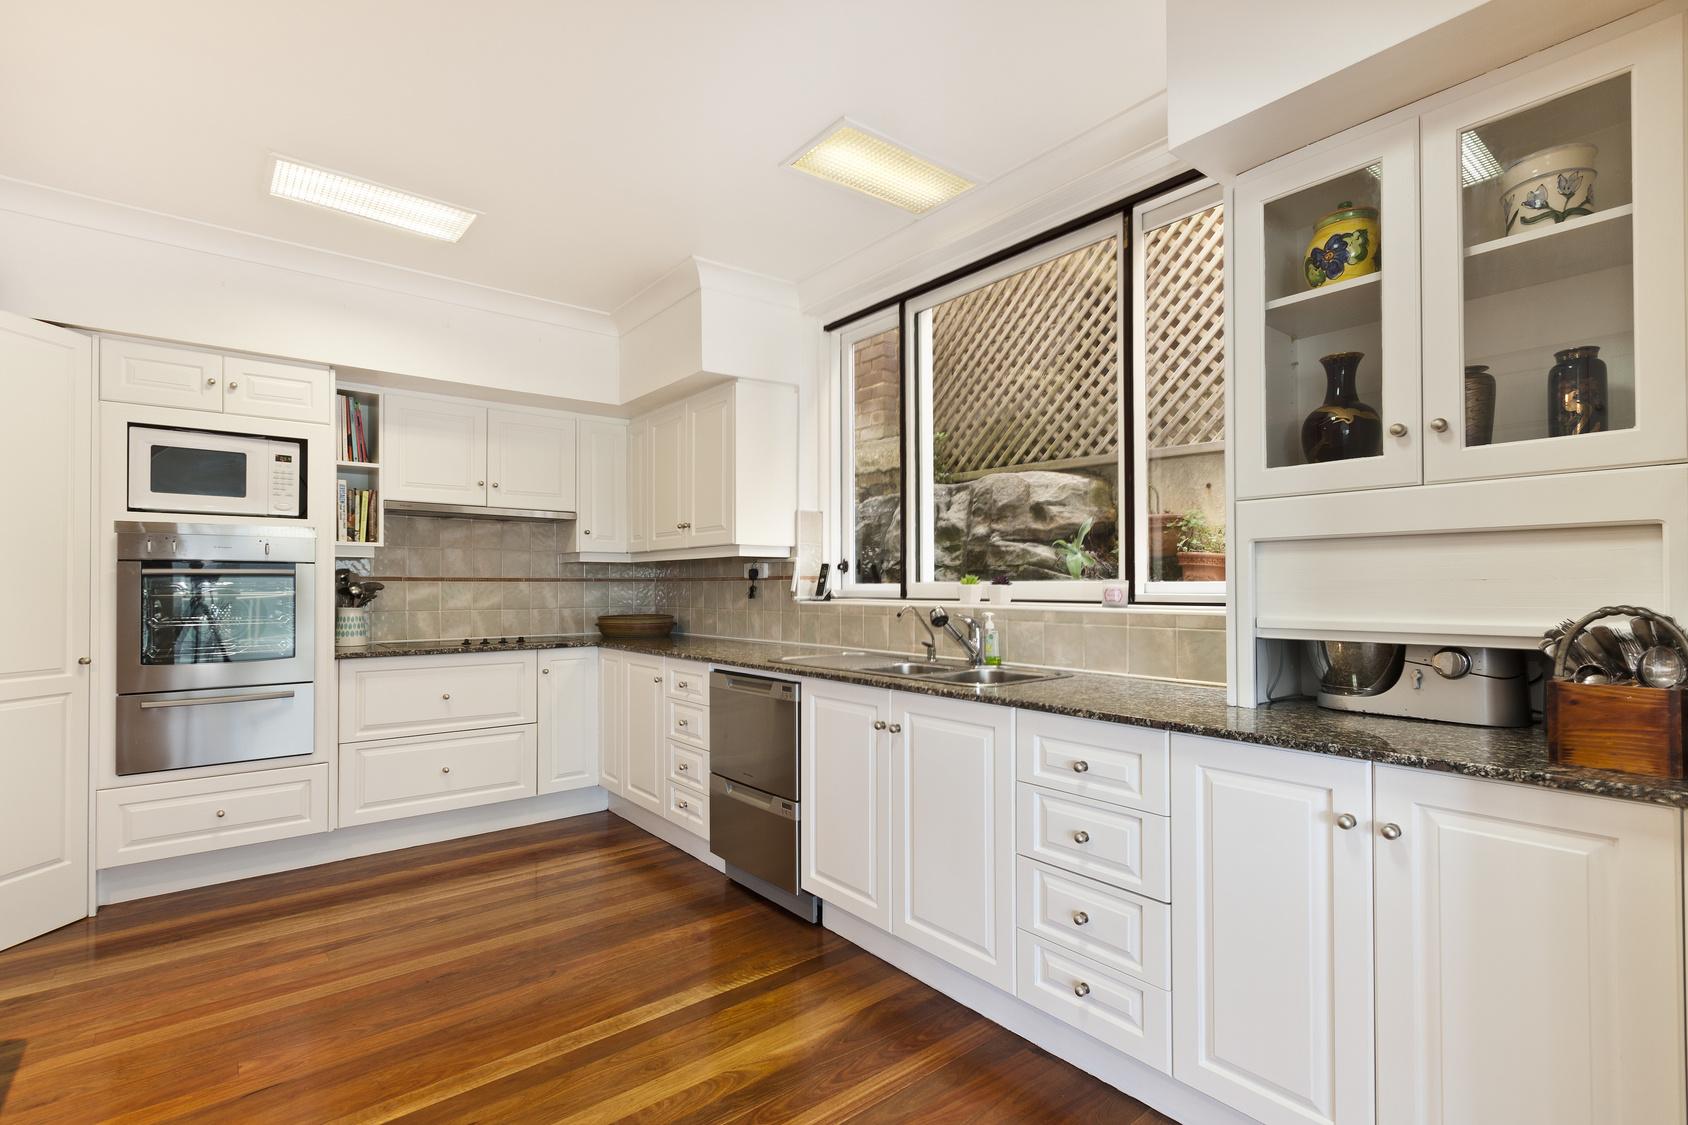 4 Designs For A More Open Kitchen Sawhorse Designers